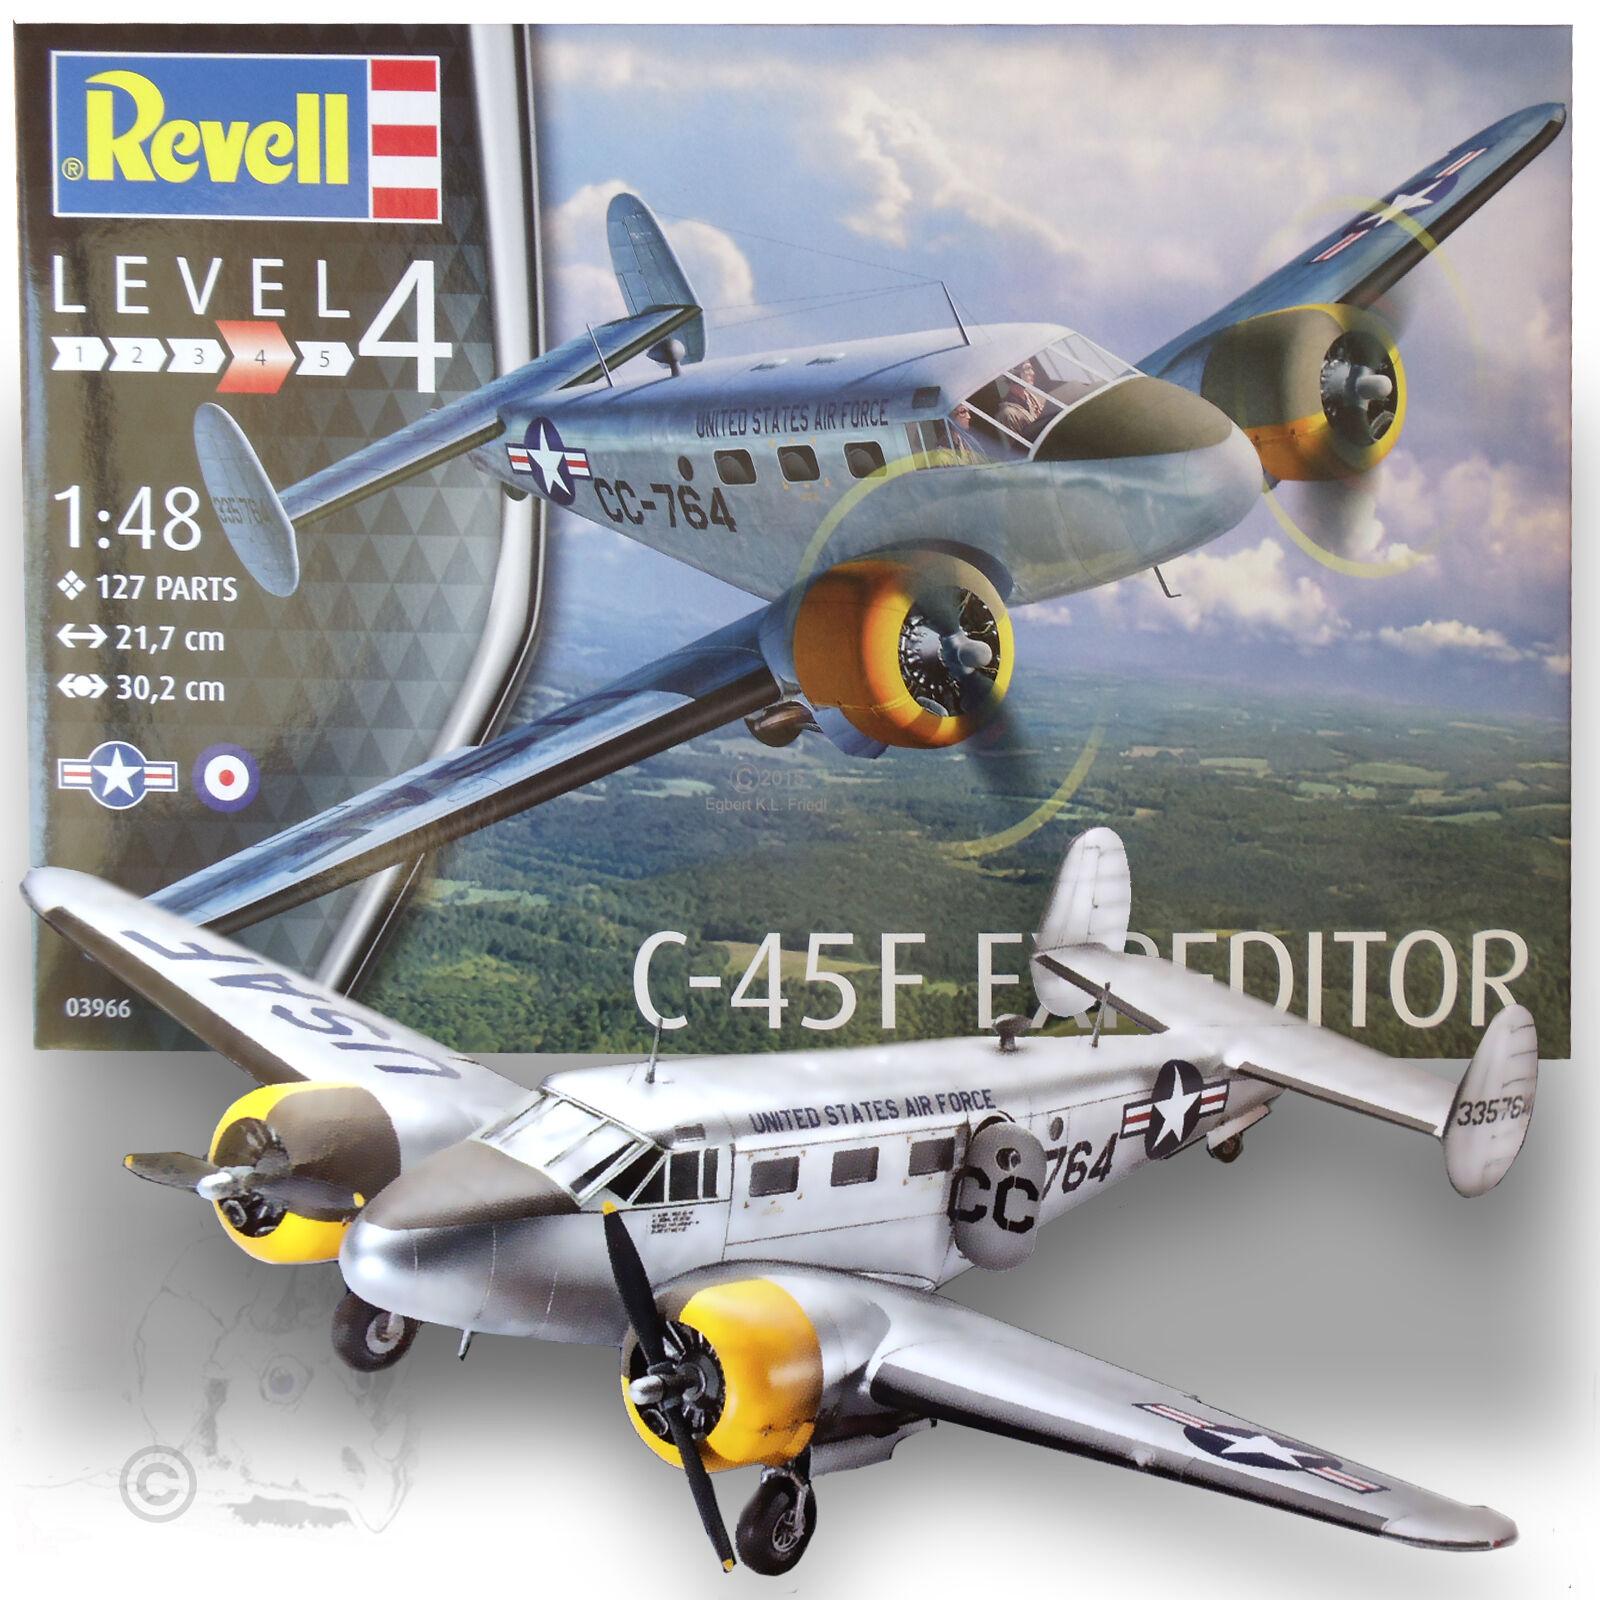 REVELL 1 48 BEACHCRAFT C-45F EXPEDITOR KIT 3966